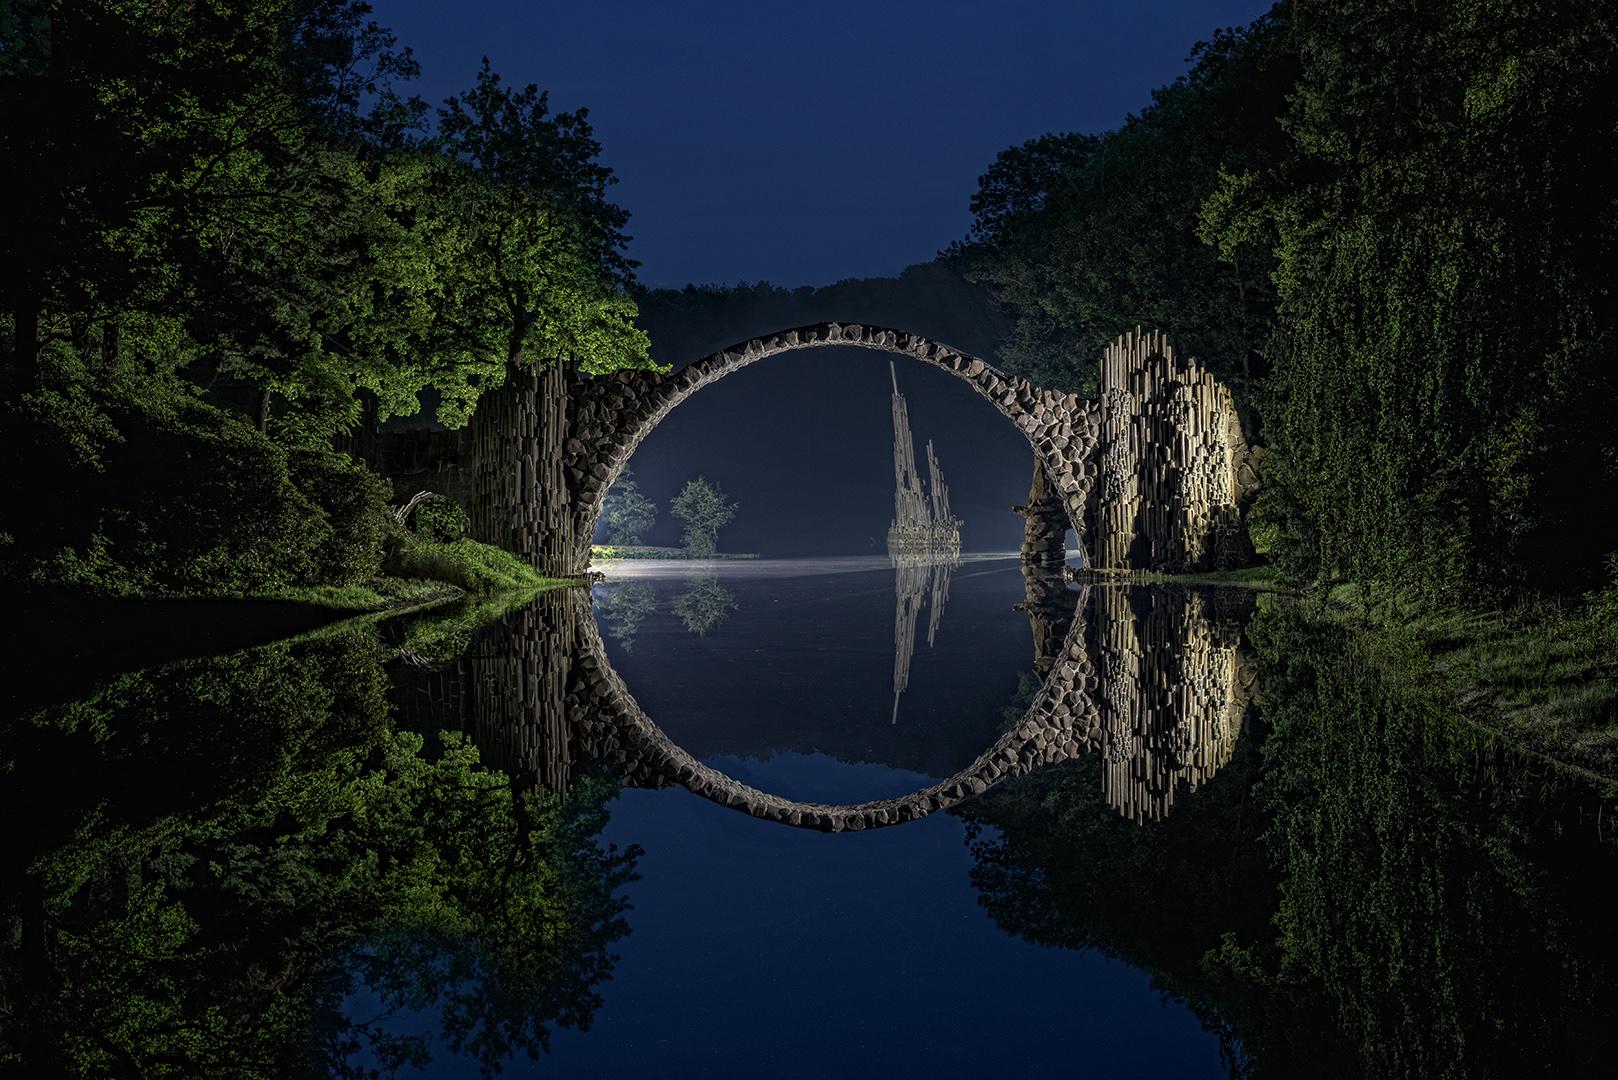 Rakotzbrücke zur Blauen Stunde